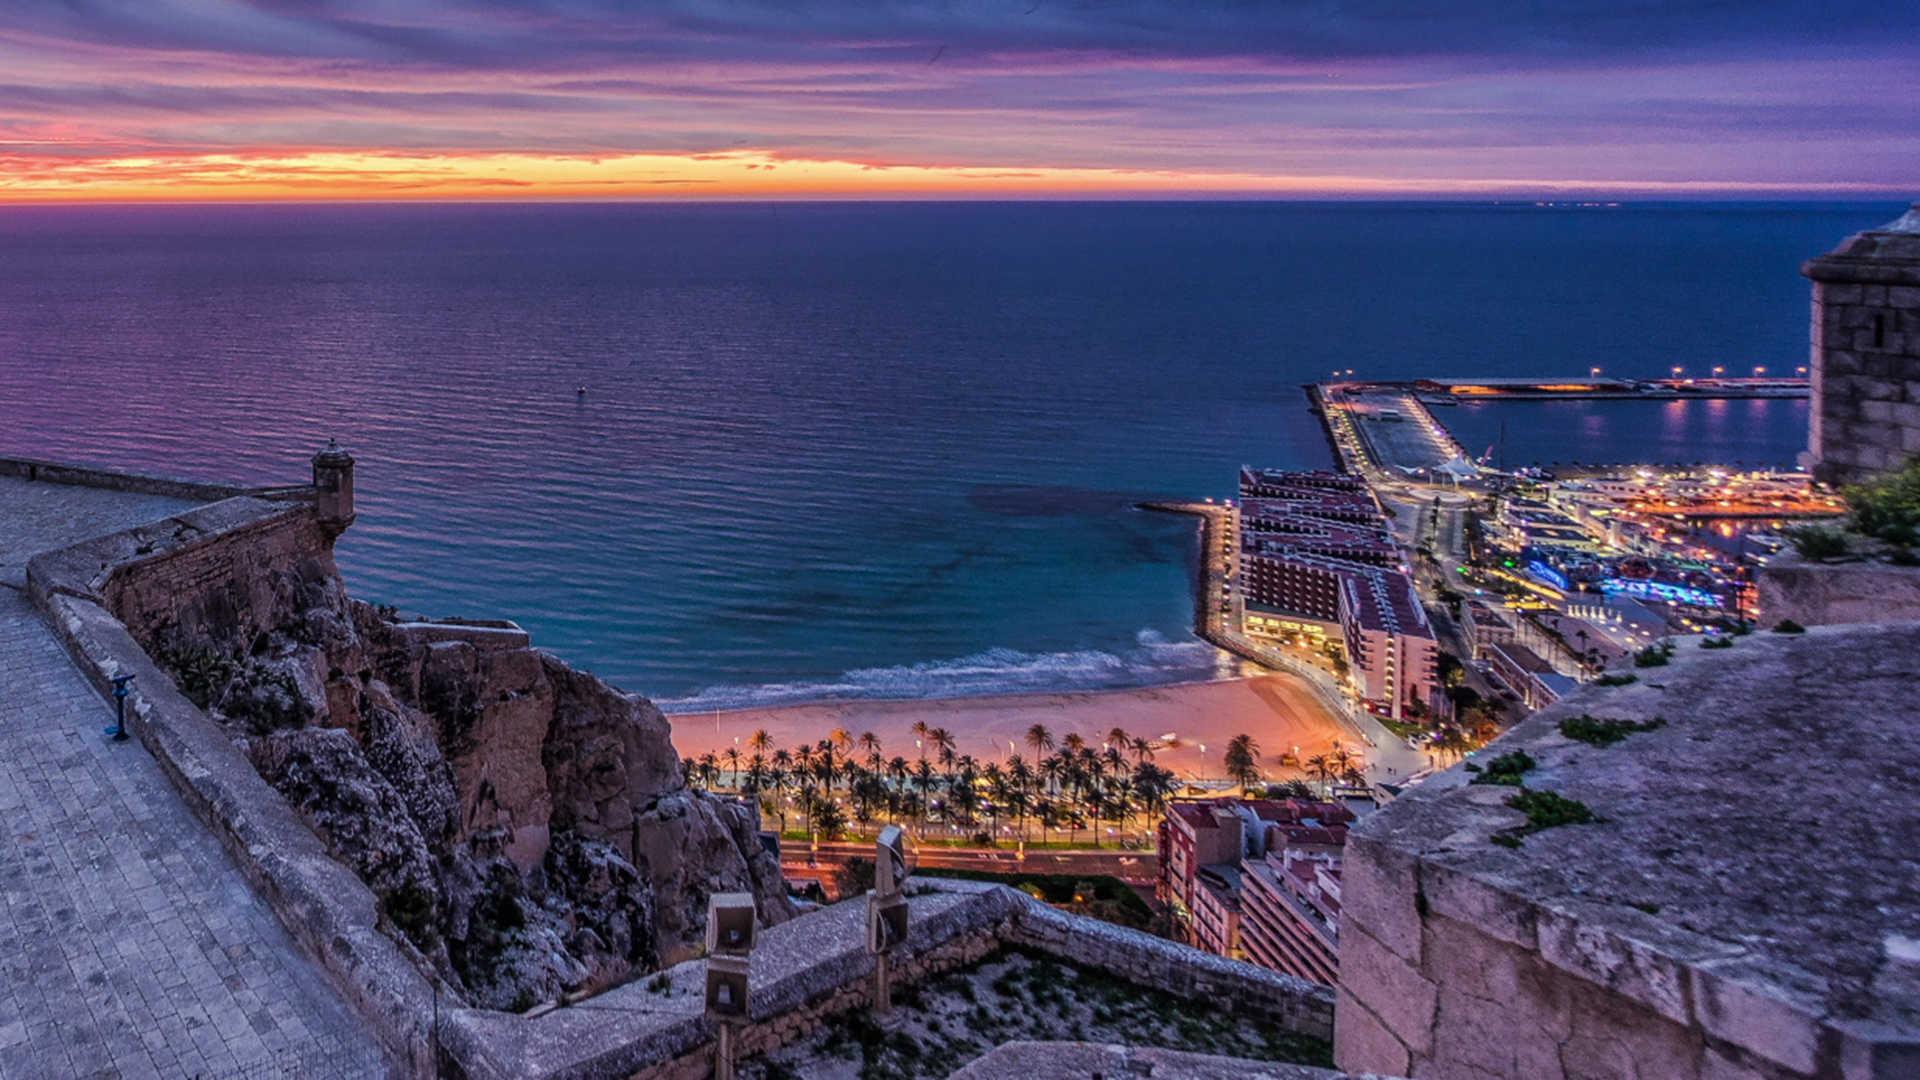 Alacant/Alicante